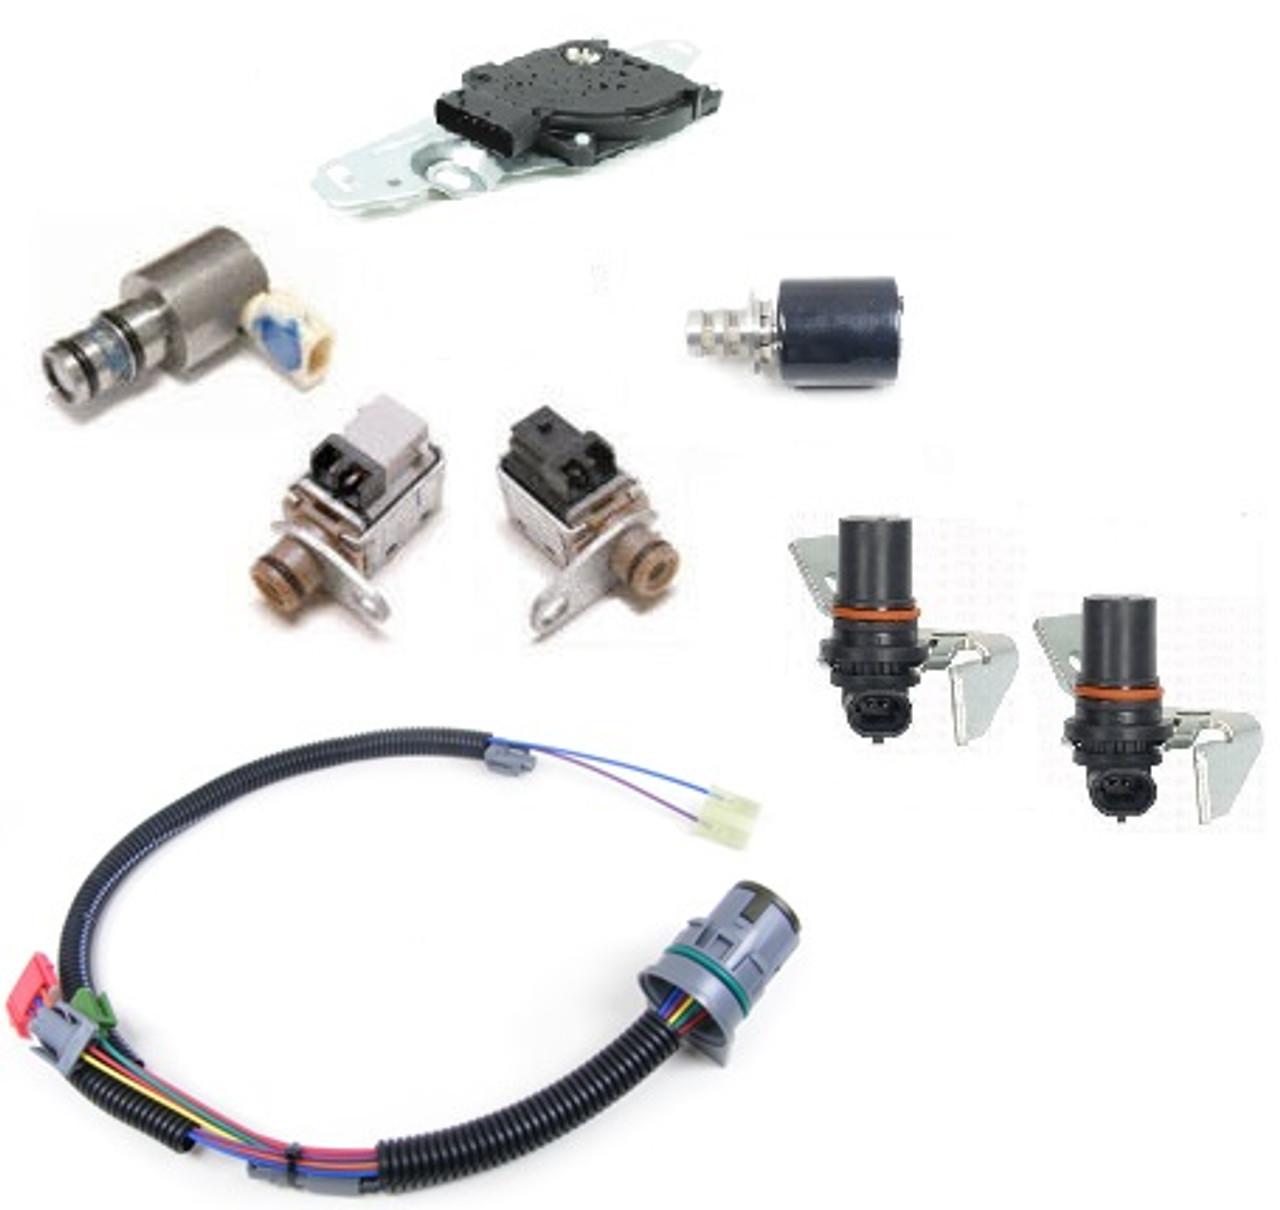 4L80E TRANSMISSION SOLENOIDS, SWITCH, WIRE HARNESS, & SENSORS KIT FITS  '95-'03 ORIGINAL EQUIPMENT - Transmission Parts DistributorsTransmission Parts Distributors